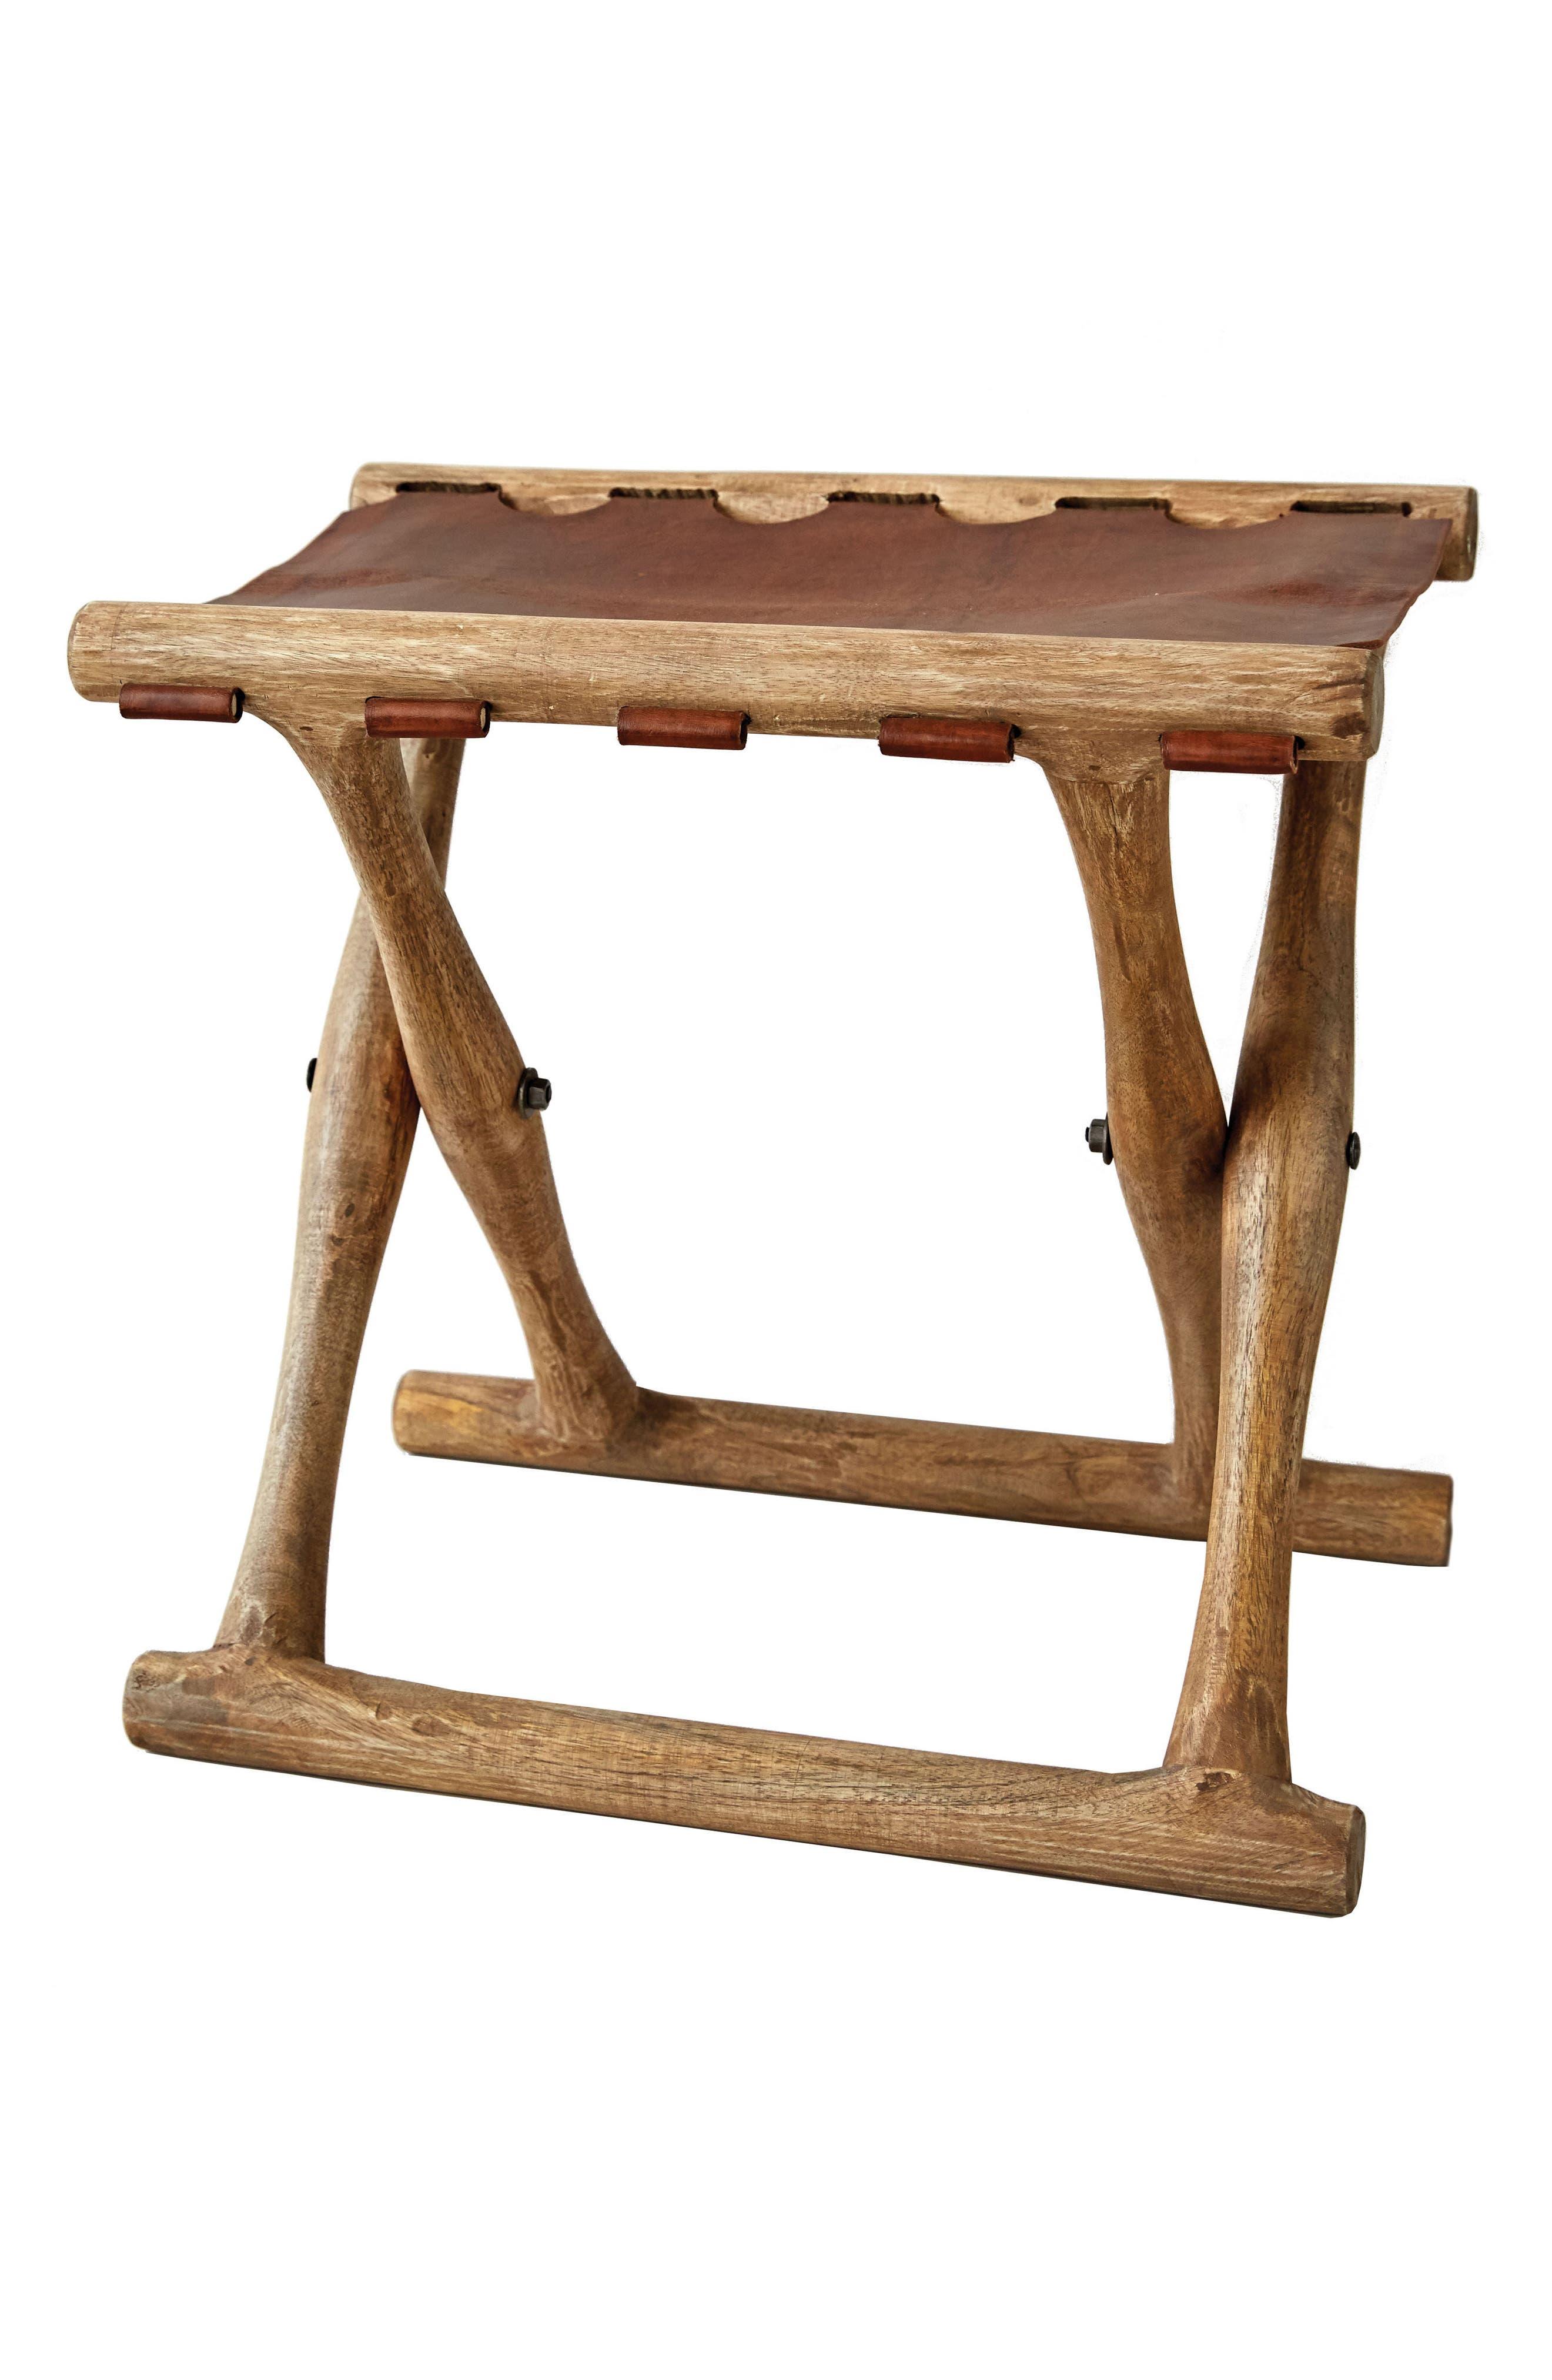 Main Image - Creative Co-Op Folding Wood Stool